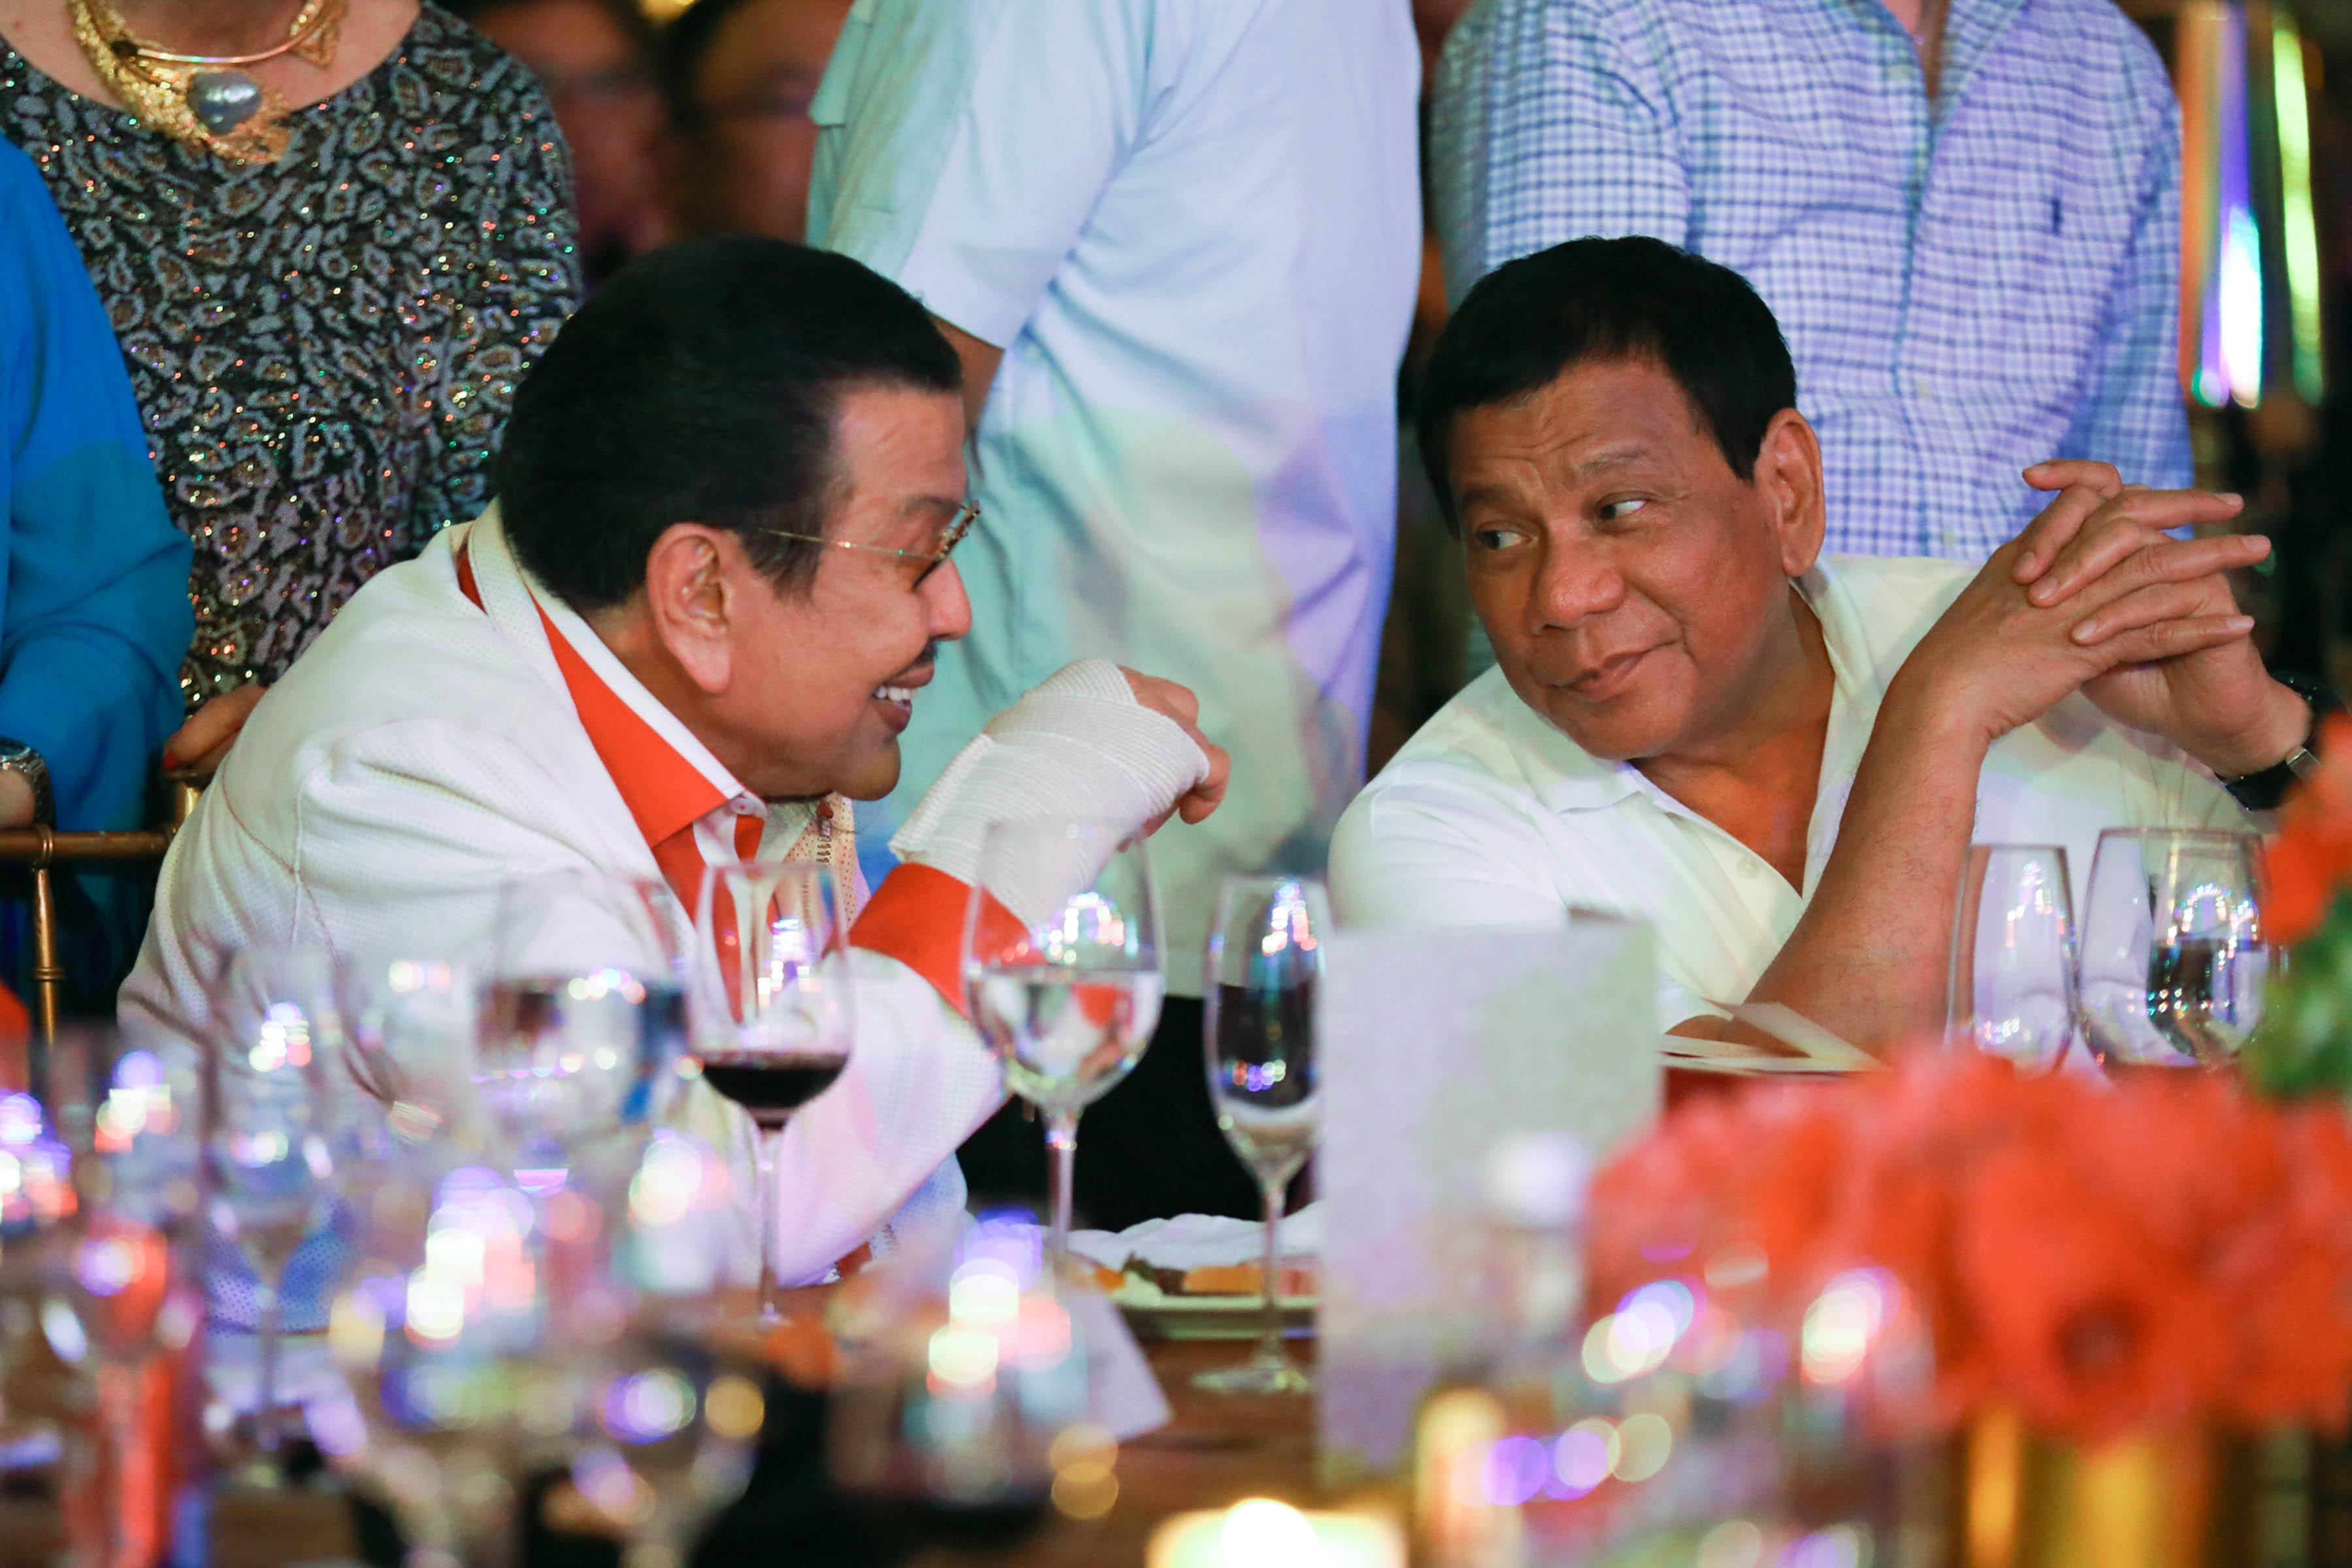 ERAP'S BIRTHDAY. President Rodrigo Duterte at the birthday celebration of former president now Manila Mayor Joseph Estrada on April 19, 2017. Photo by Toto Lozano/Presidential Photo